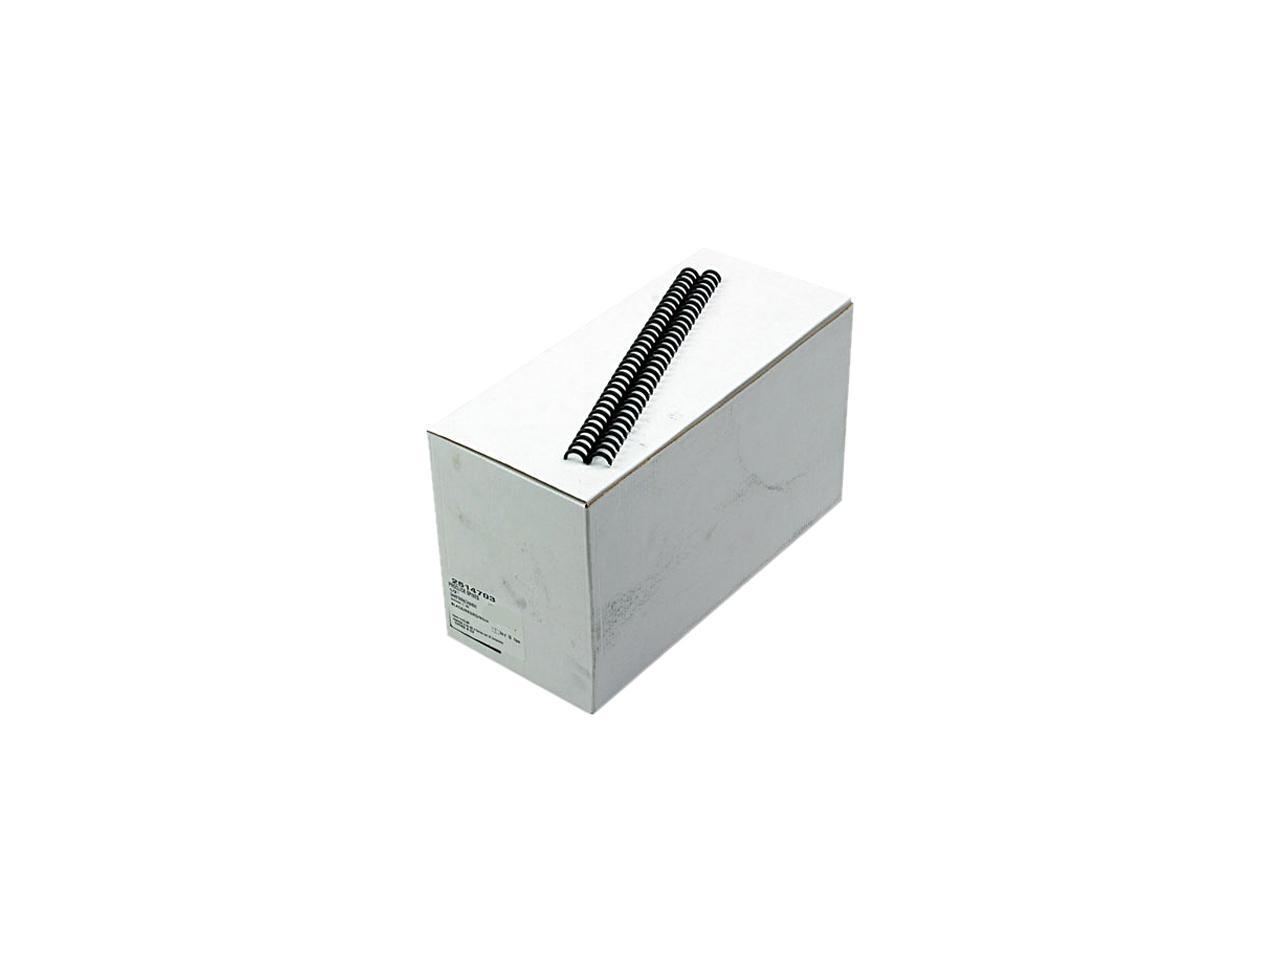 "100//Box Gbc Combbind Standard Spines Black 1//4/"" Diameter 25 Sheet Capacity"